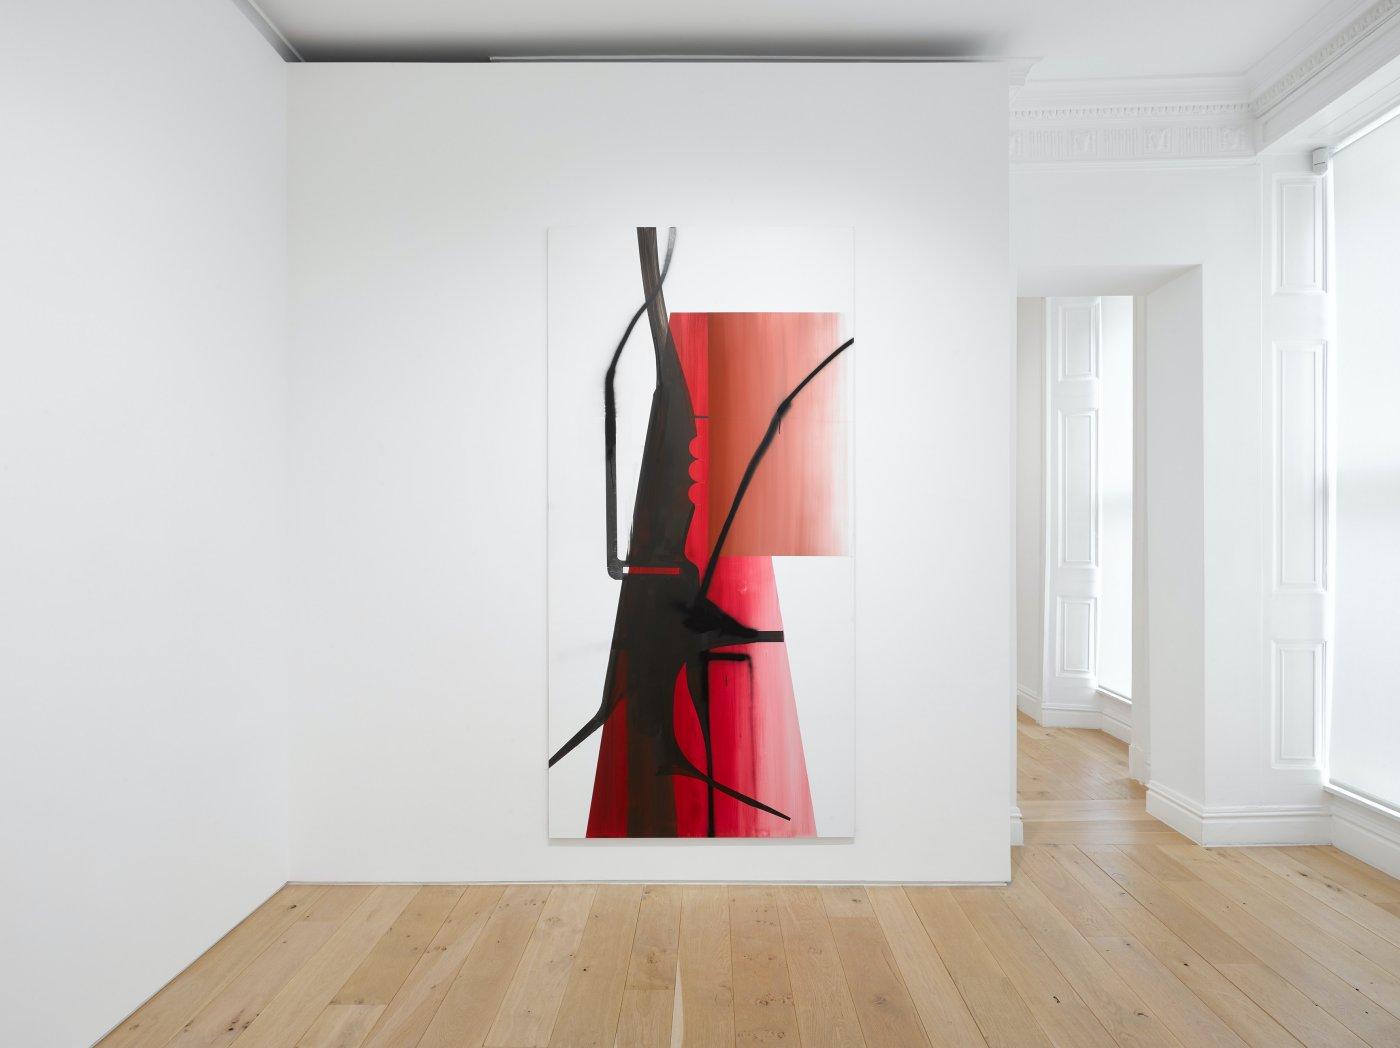 Galerie Max Hetzler London Carroll Dunham Albert Oehlen 5